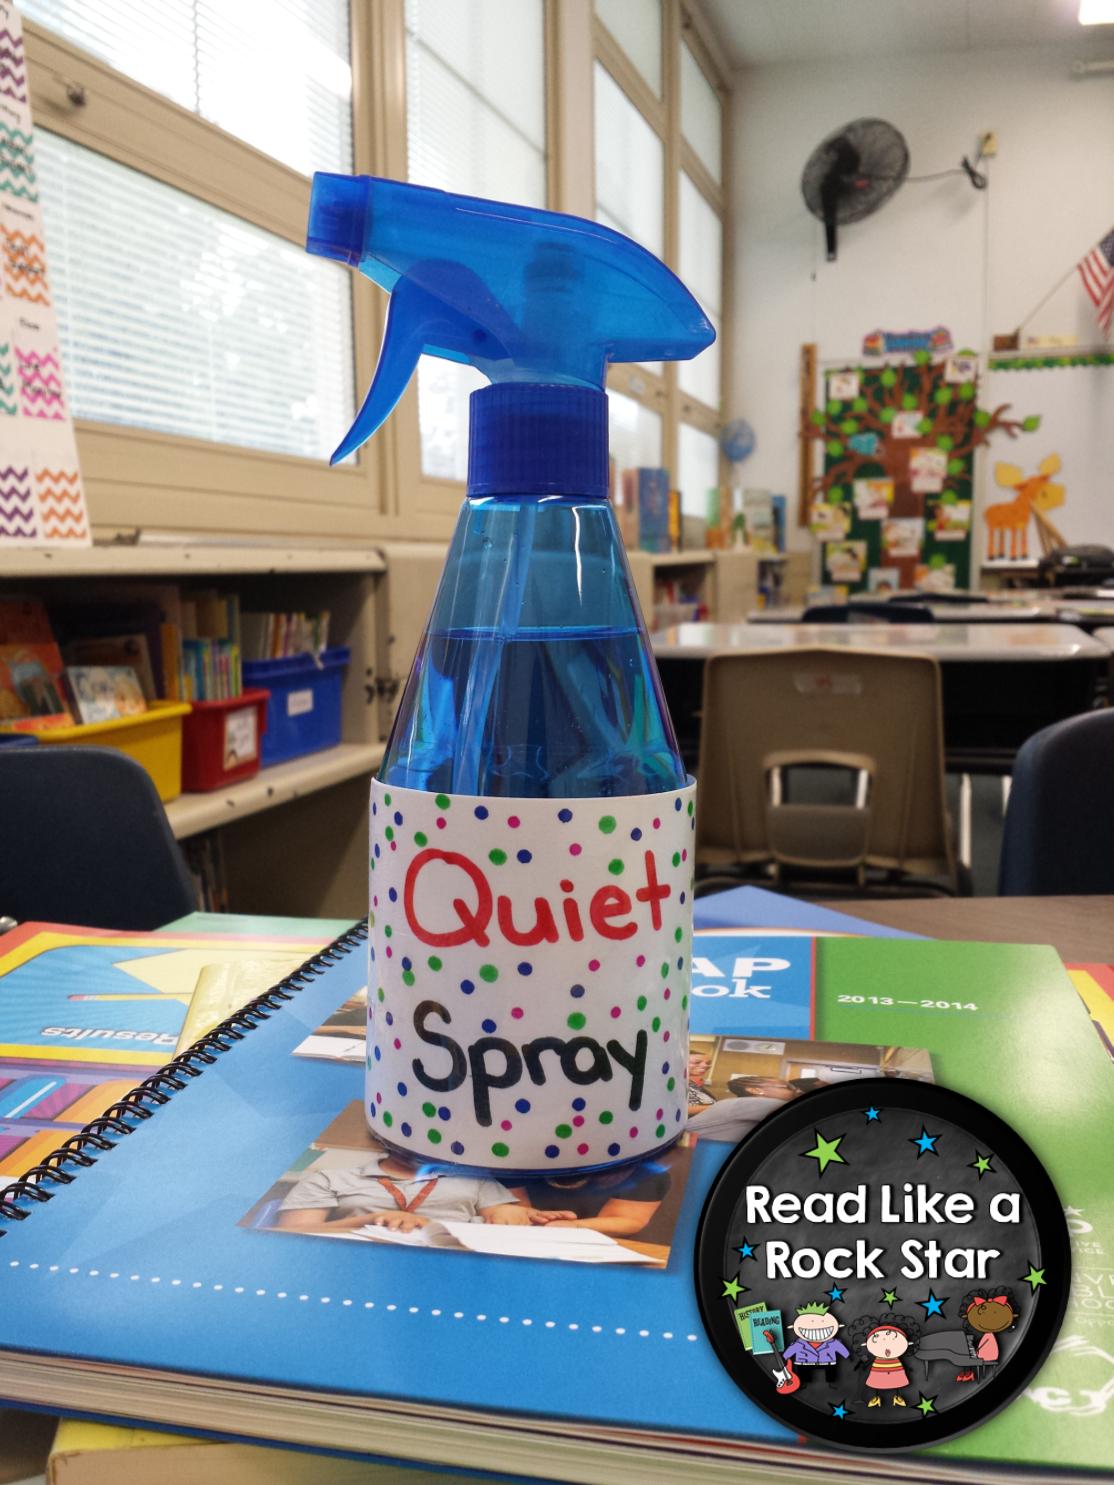 Read Like a Rock Star's Quiet Spray Bright Idea!